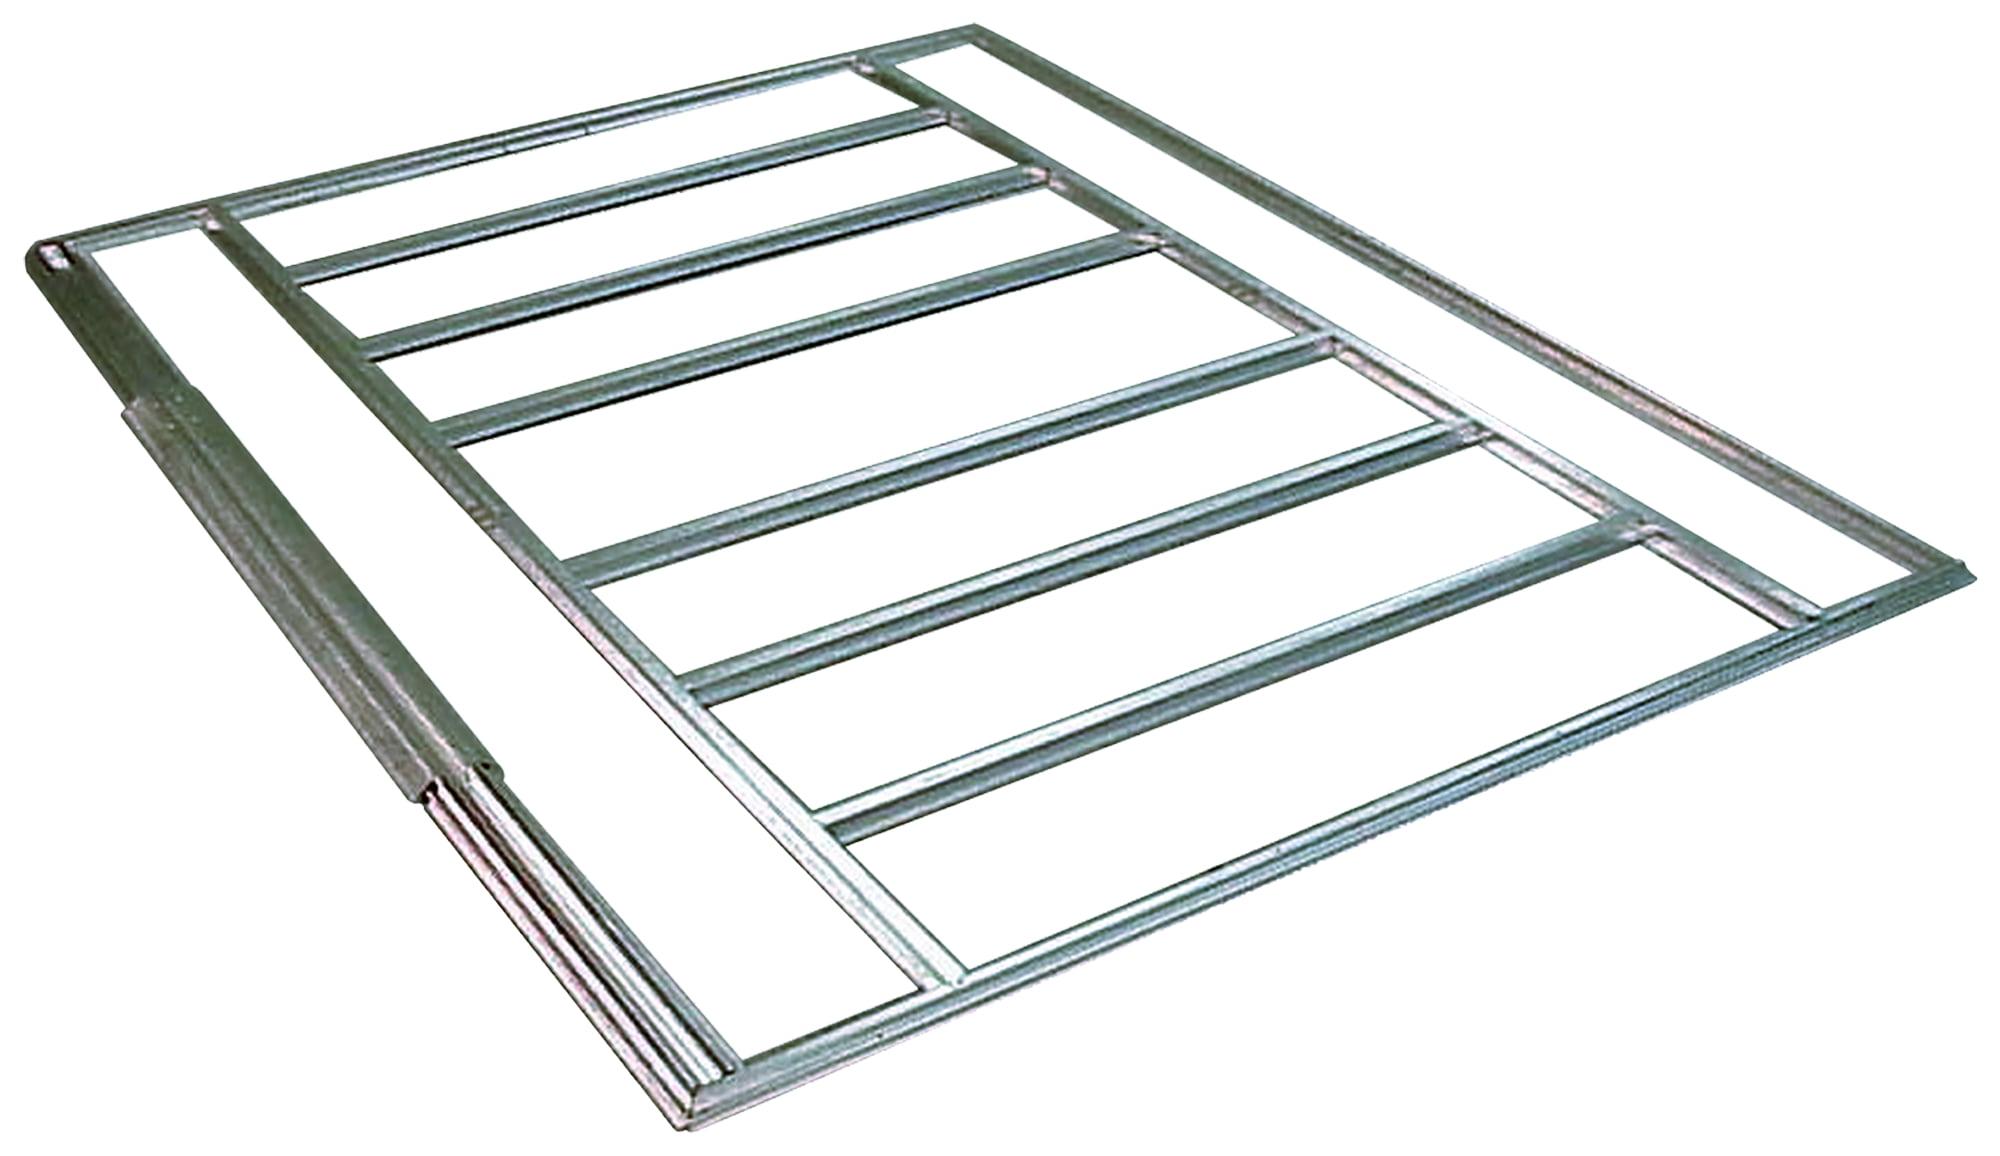 Shed Floor Frame Kit for 8 x 8 ft , 10 x 7 ft , 10 x 8 ft , 10 x 9 ft , 10  x 10 ft